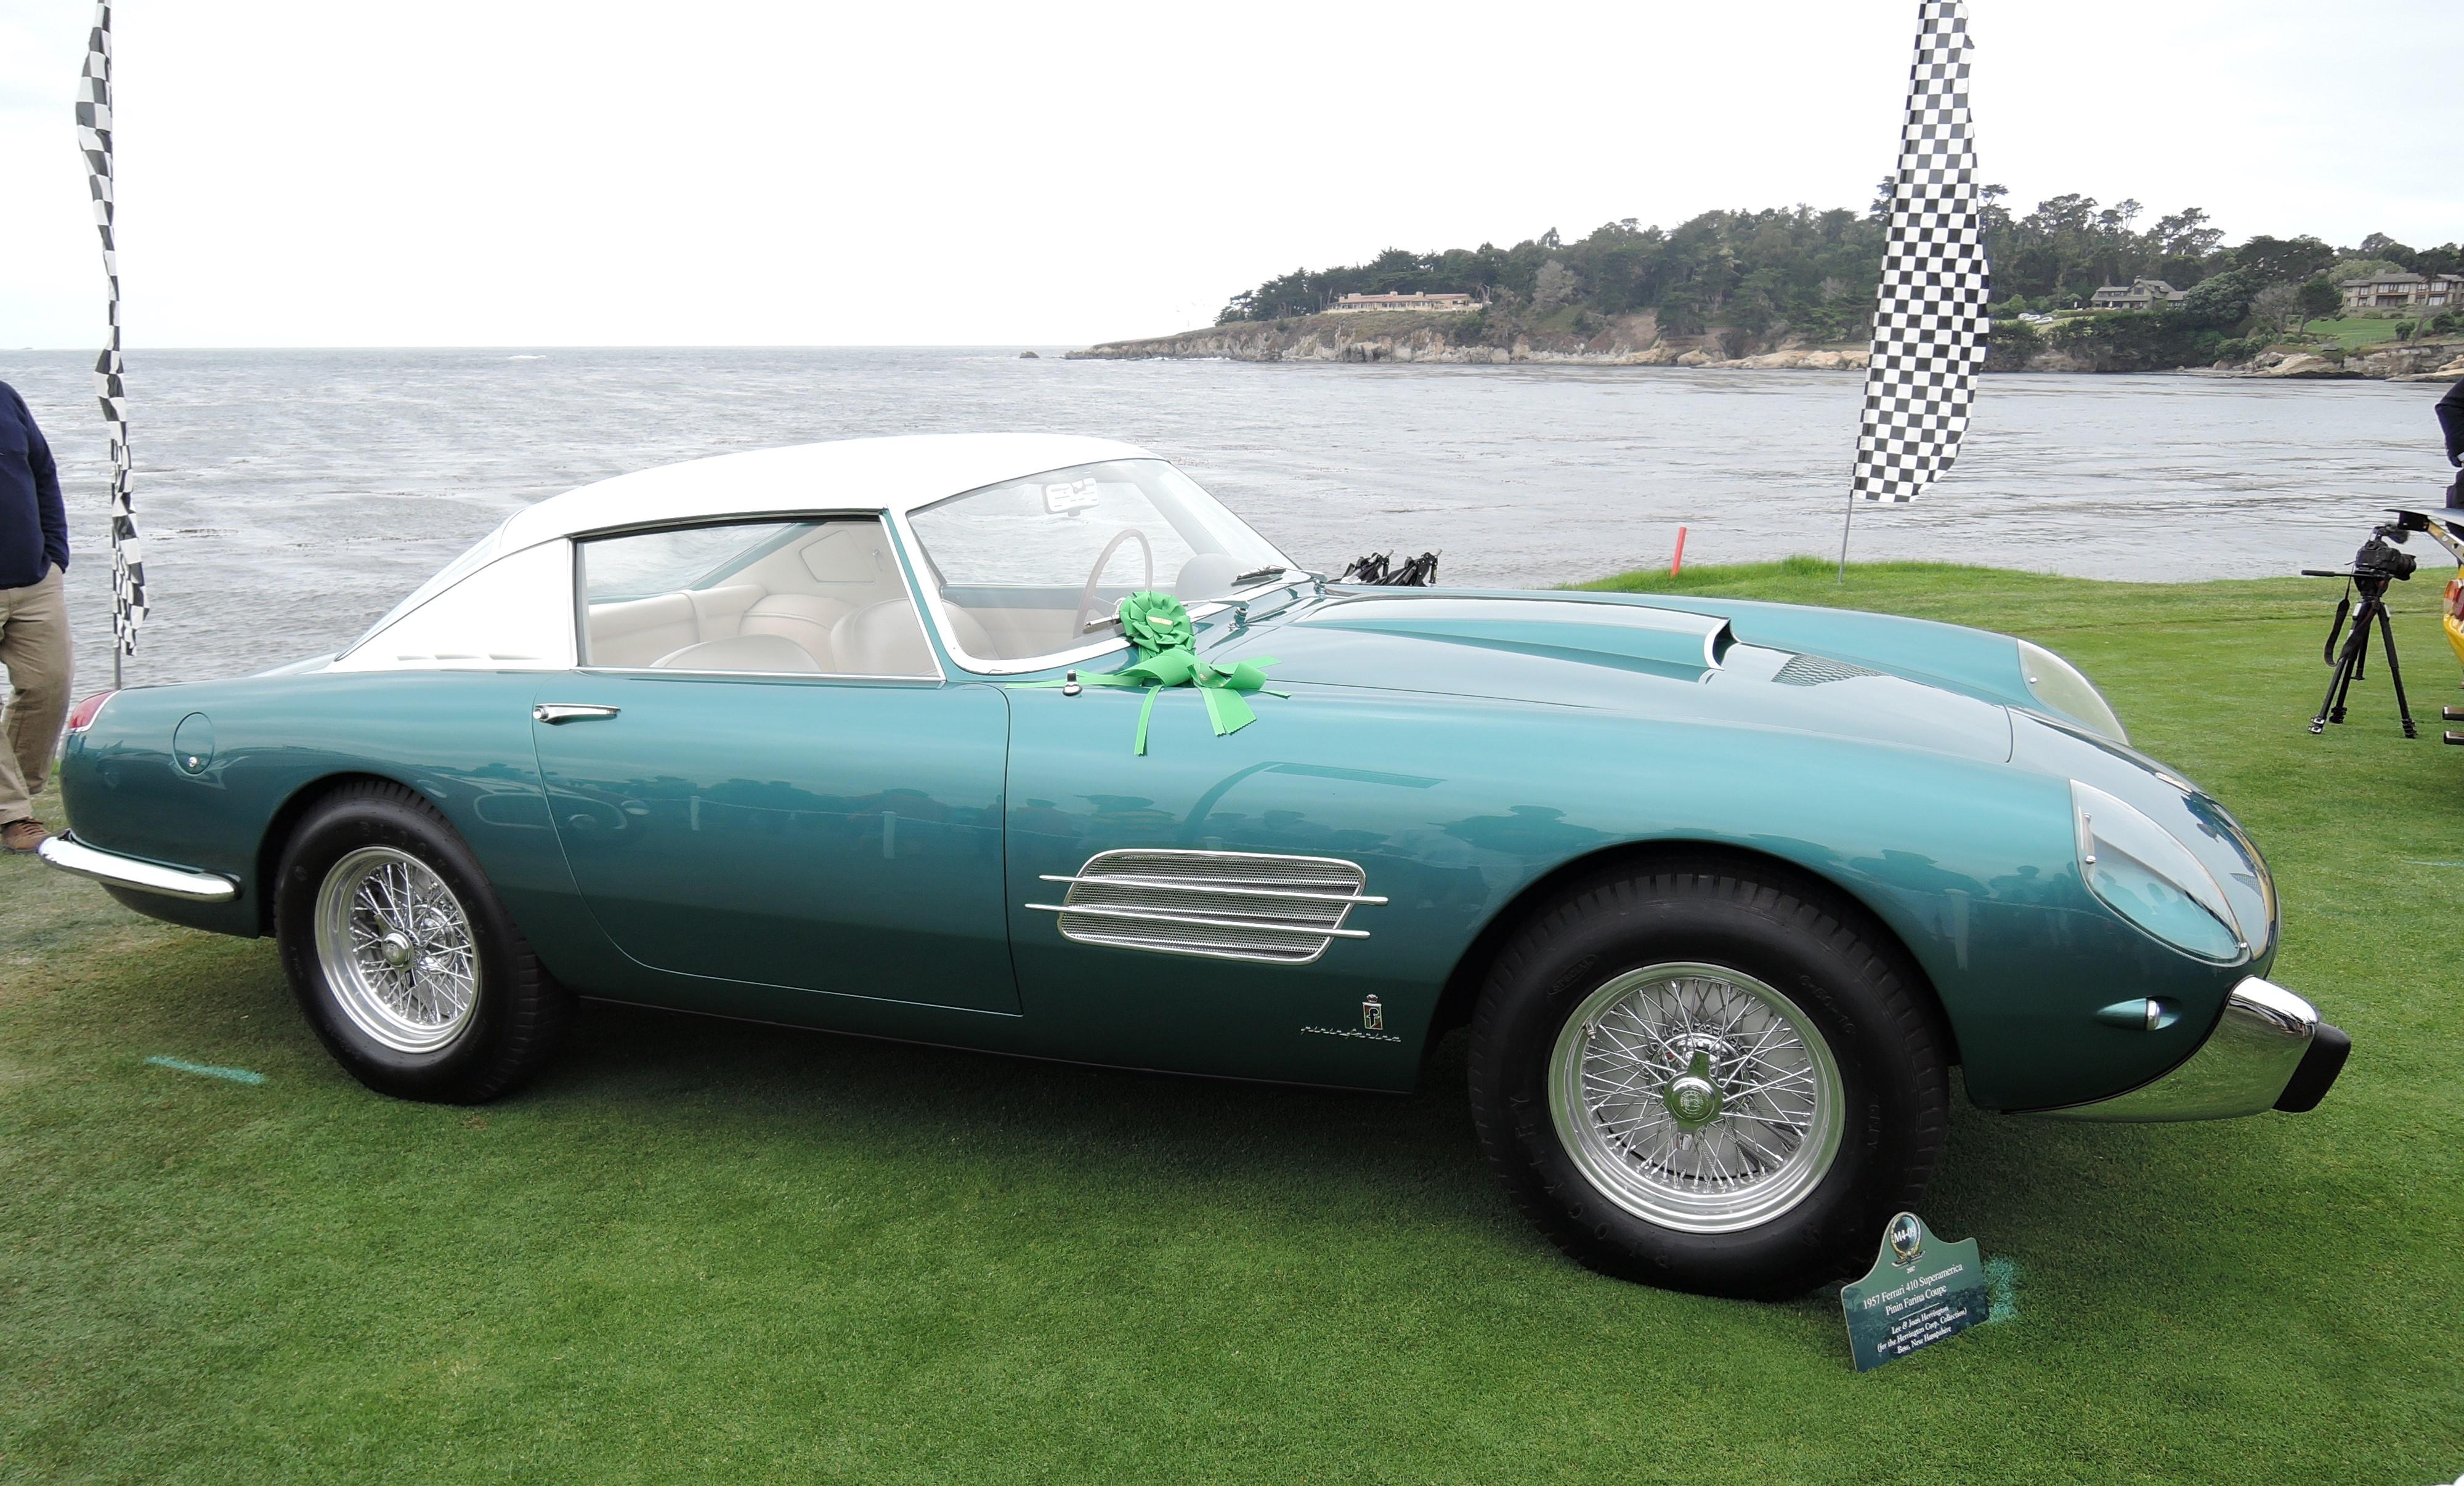 teal 1957 Ferrari 410 Superamerica Pinin Farina Coupe Sn 0719SA- Pebble Beach Concours d'Elegance 2017